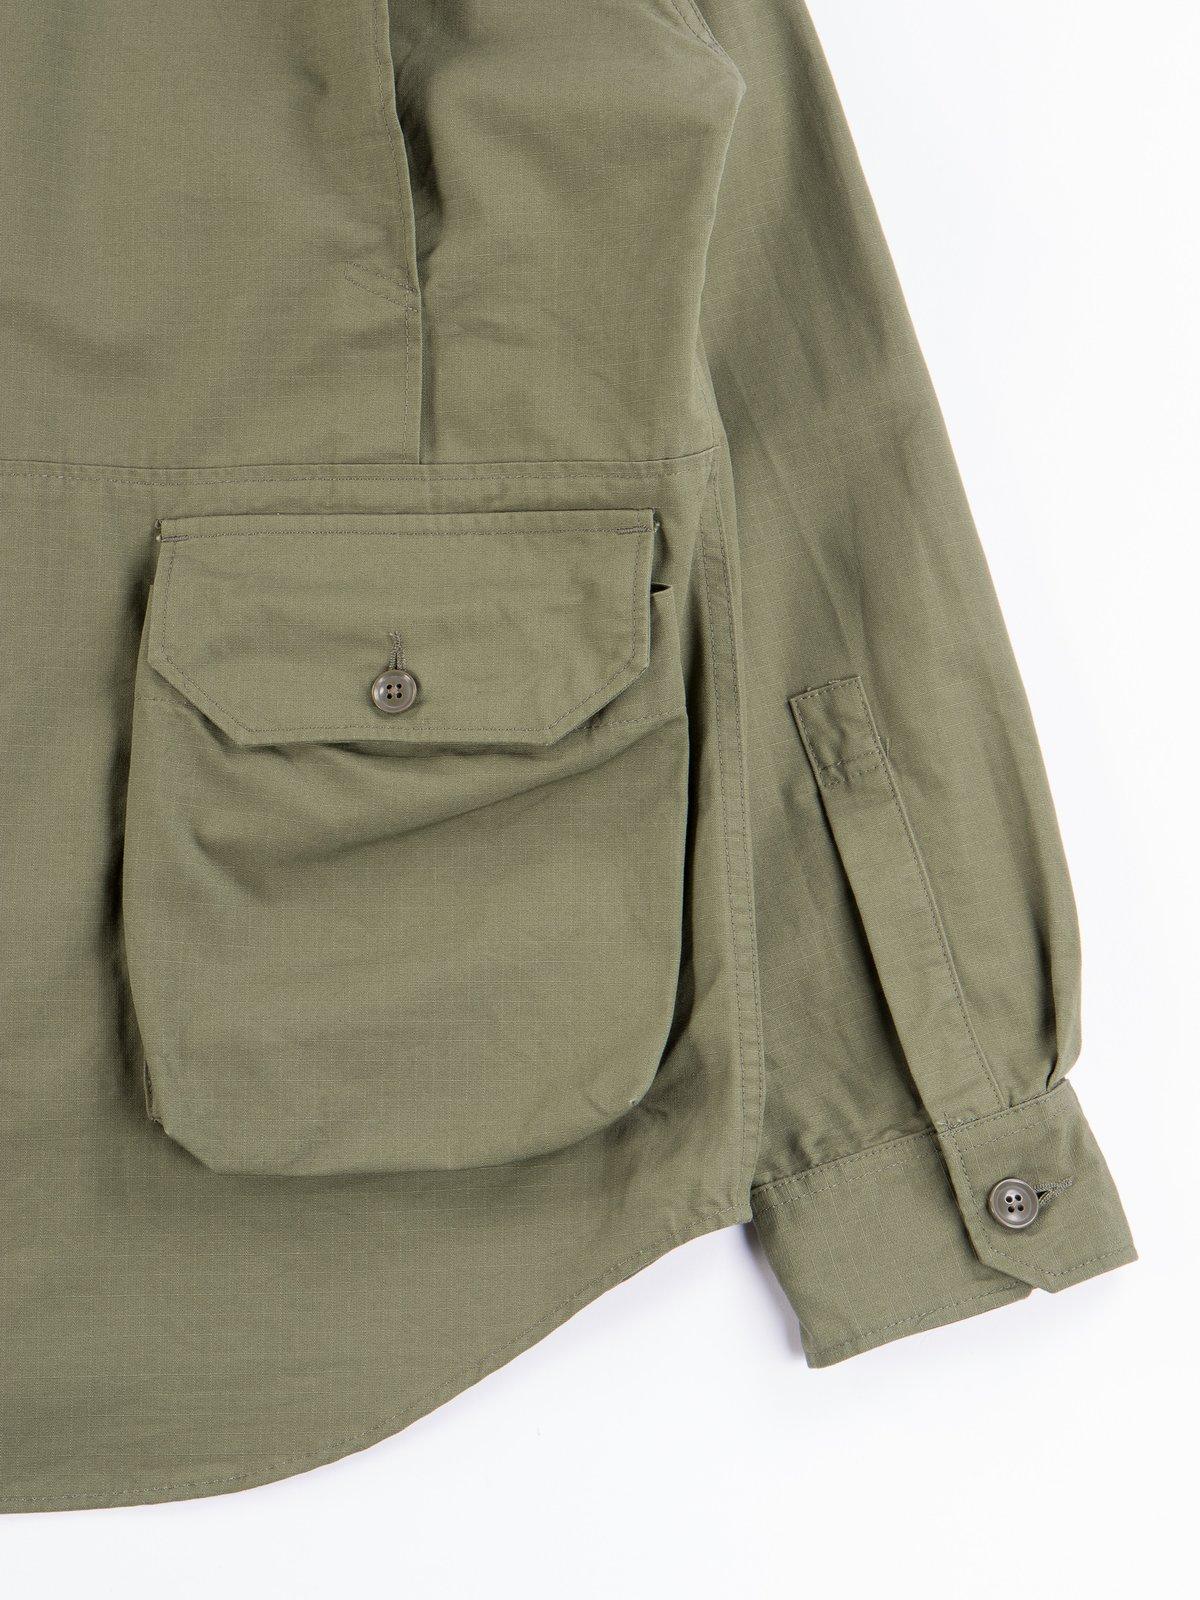 Olive Cotton Ripstop Explorer Shirt Jacket - Image 8